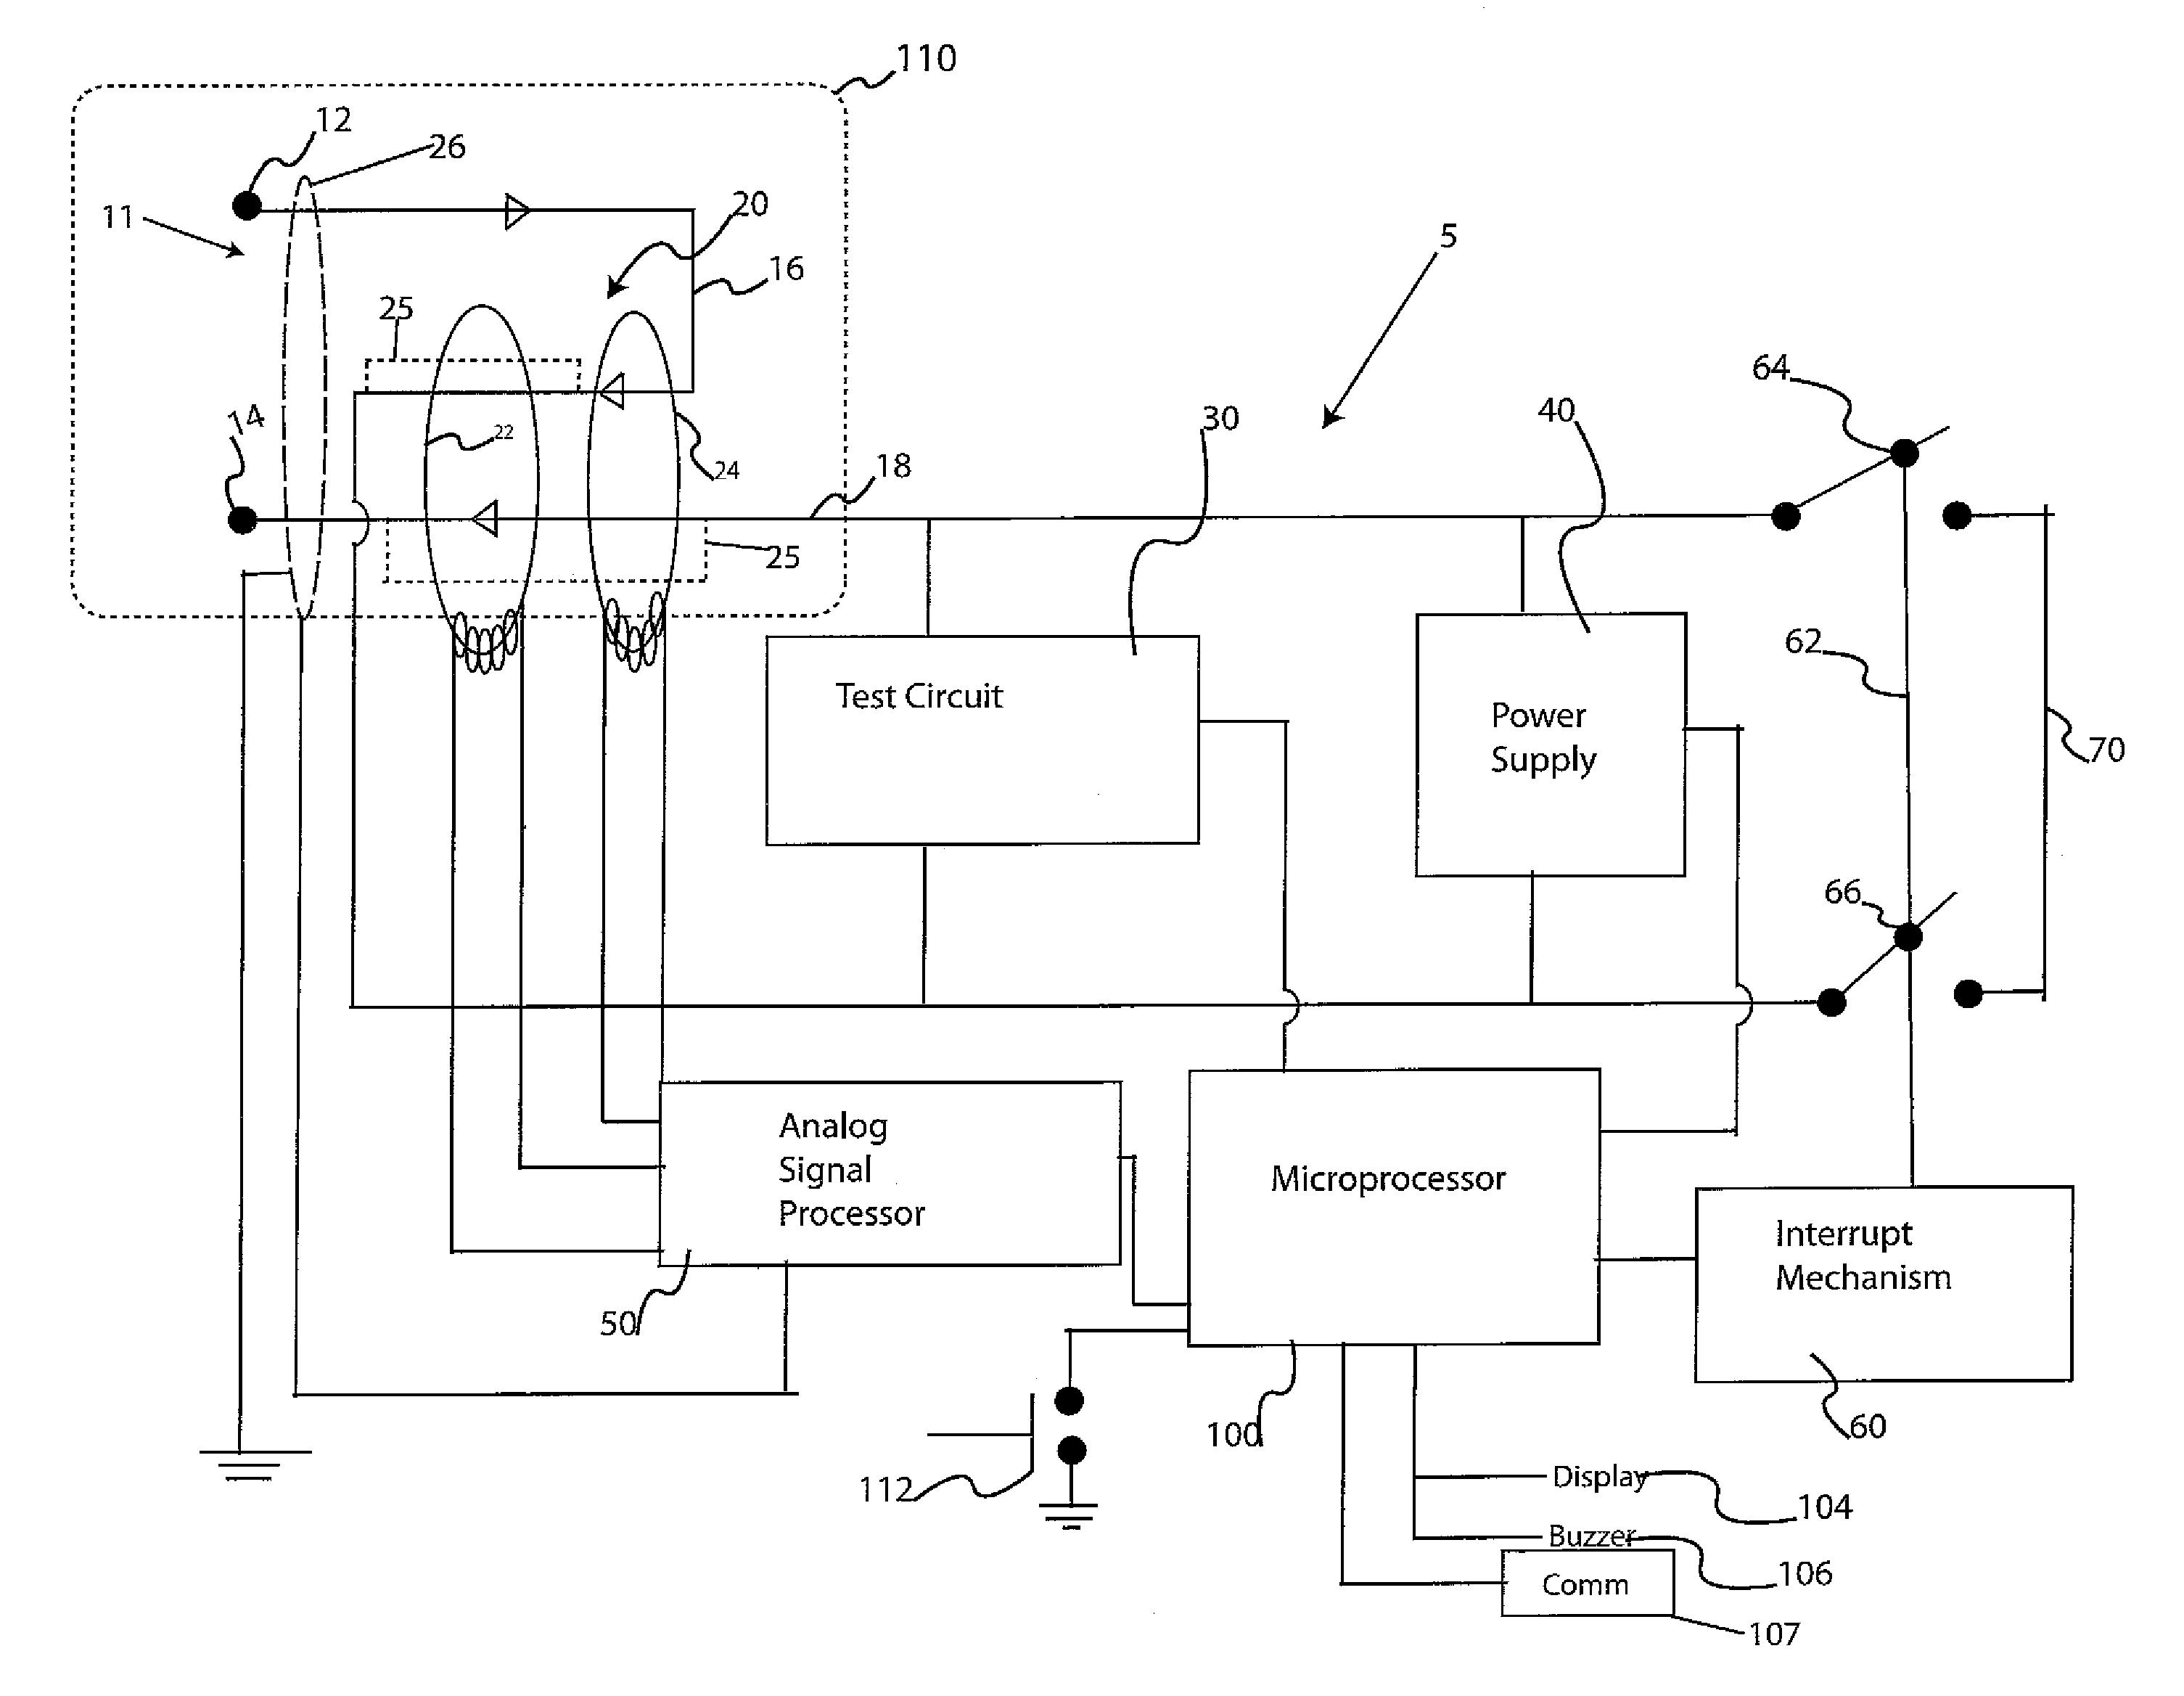 Wiring Arc Fault Schematics Diagrams Breaker Patent Us8599523 Circuit Interrupter Google Installing Breakers